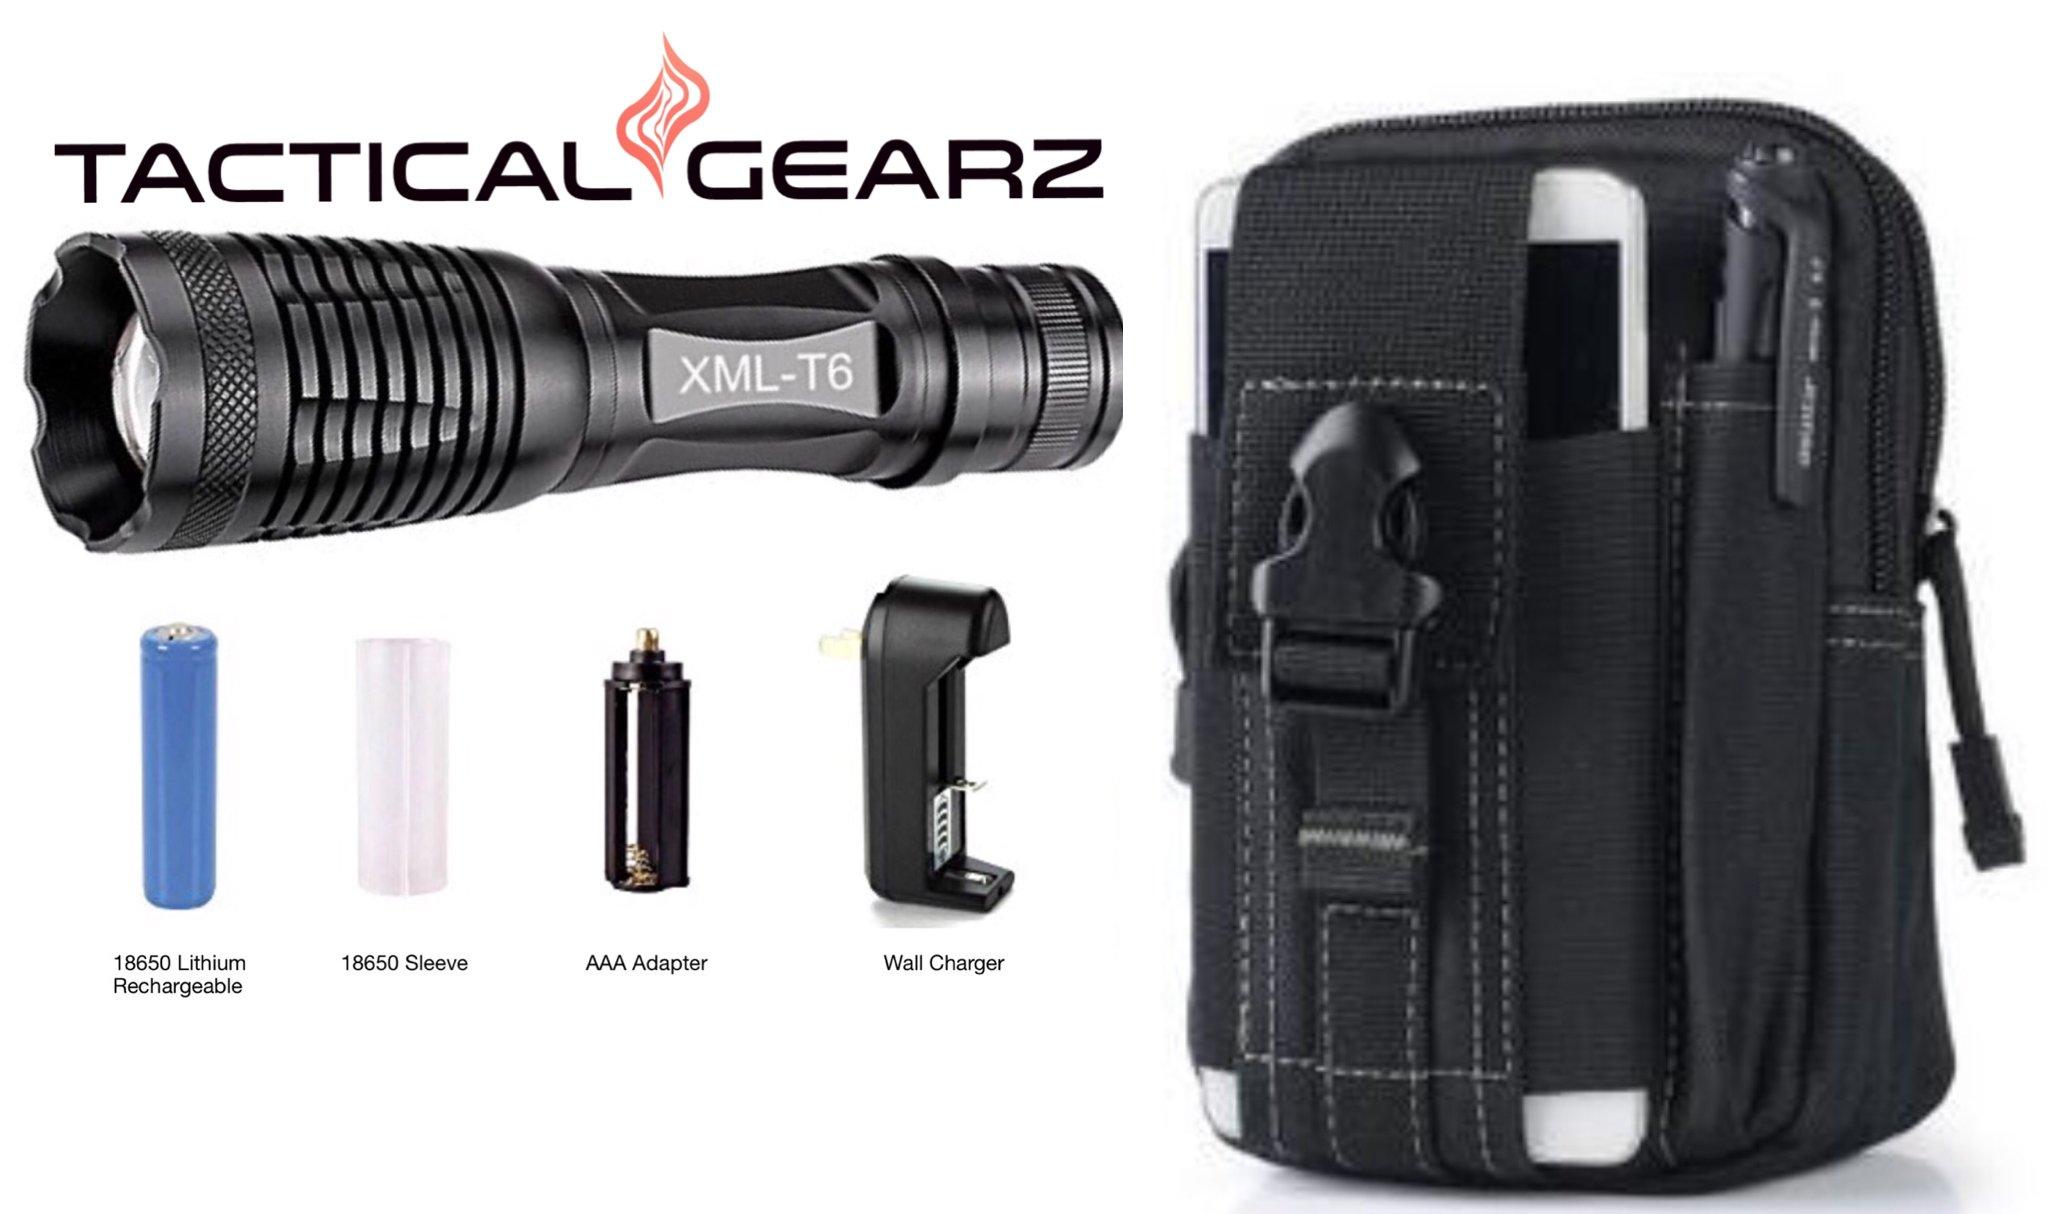 TacticalGearz LED Flashlight Survival Bundle! High Power LED Aluminum Flashlight, Multi-Function Paracord Bracelet, Tactical Day Pack and more! (Black)